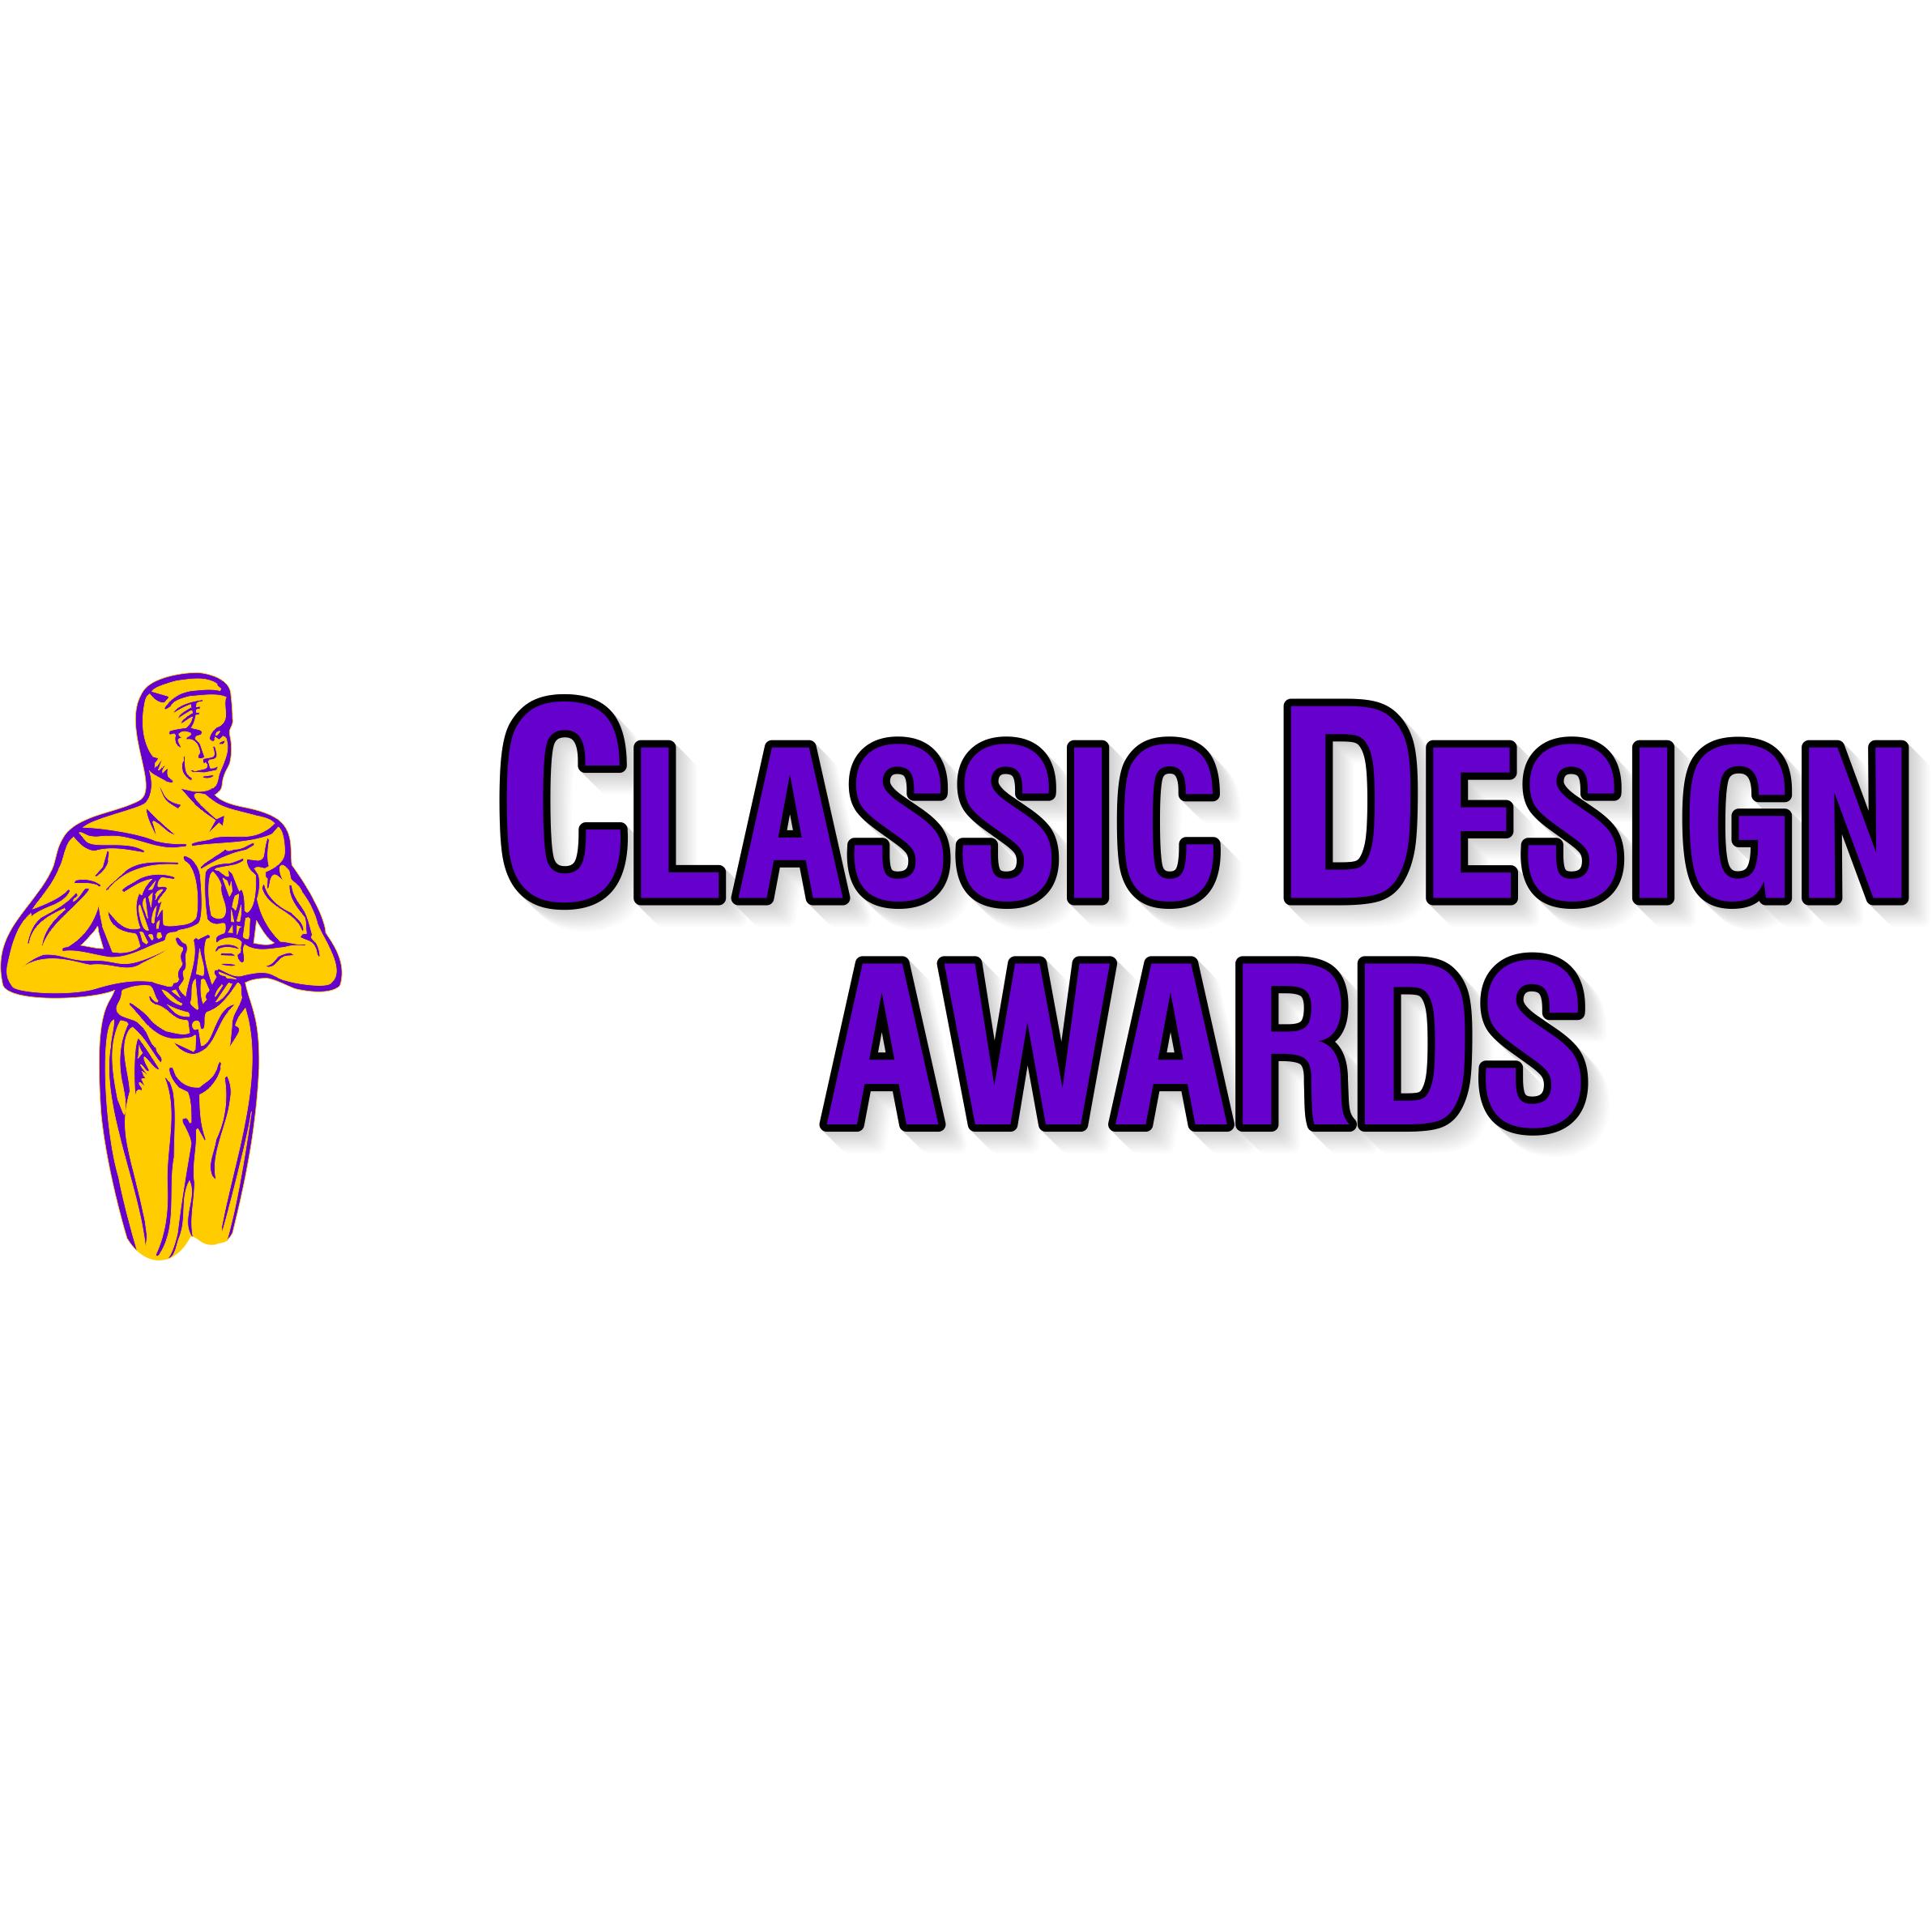 Classic Design Awards Inc - Morton Grove, IL - Trophies & Engraving